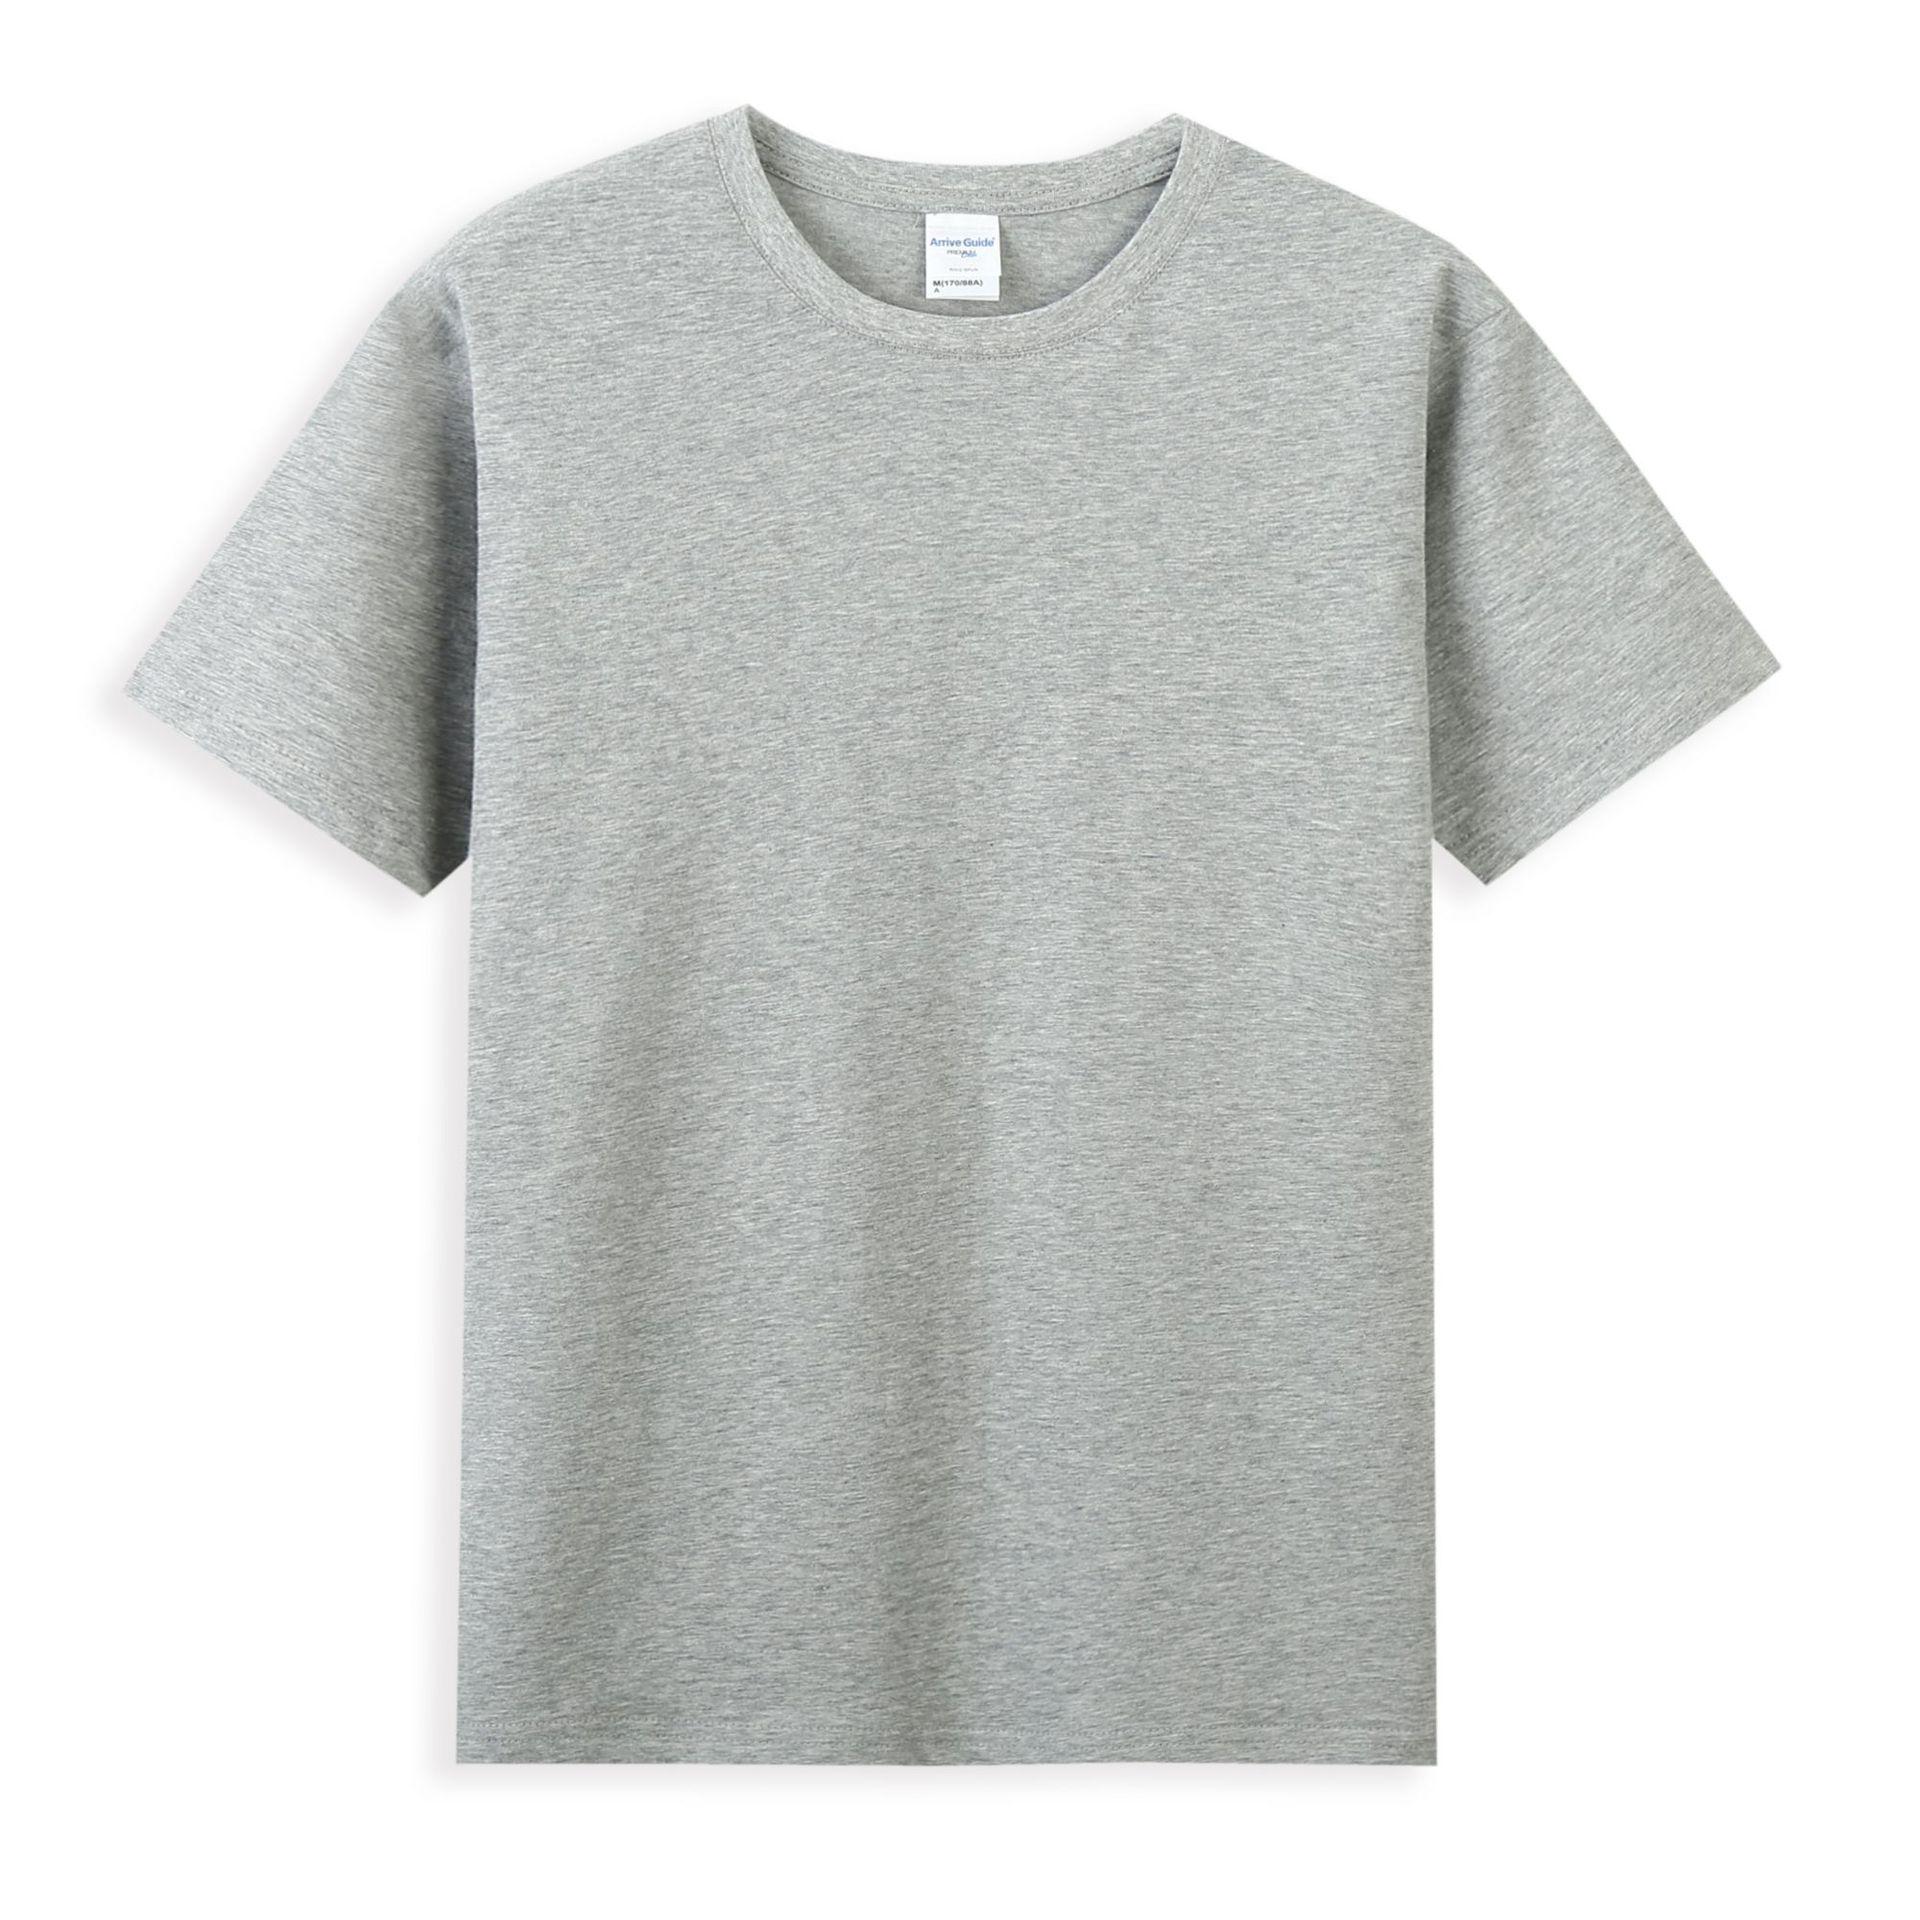 AG简约纯色T恤22色 40S双纱短袖通款